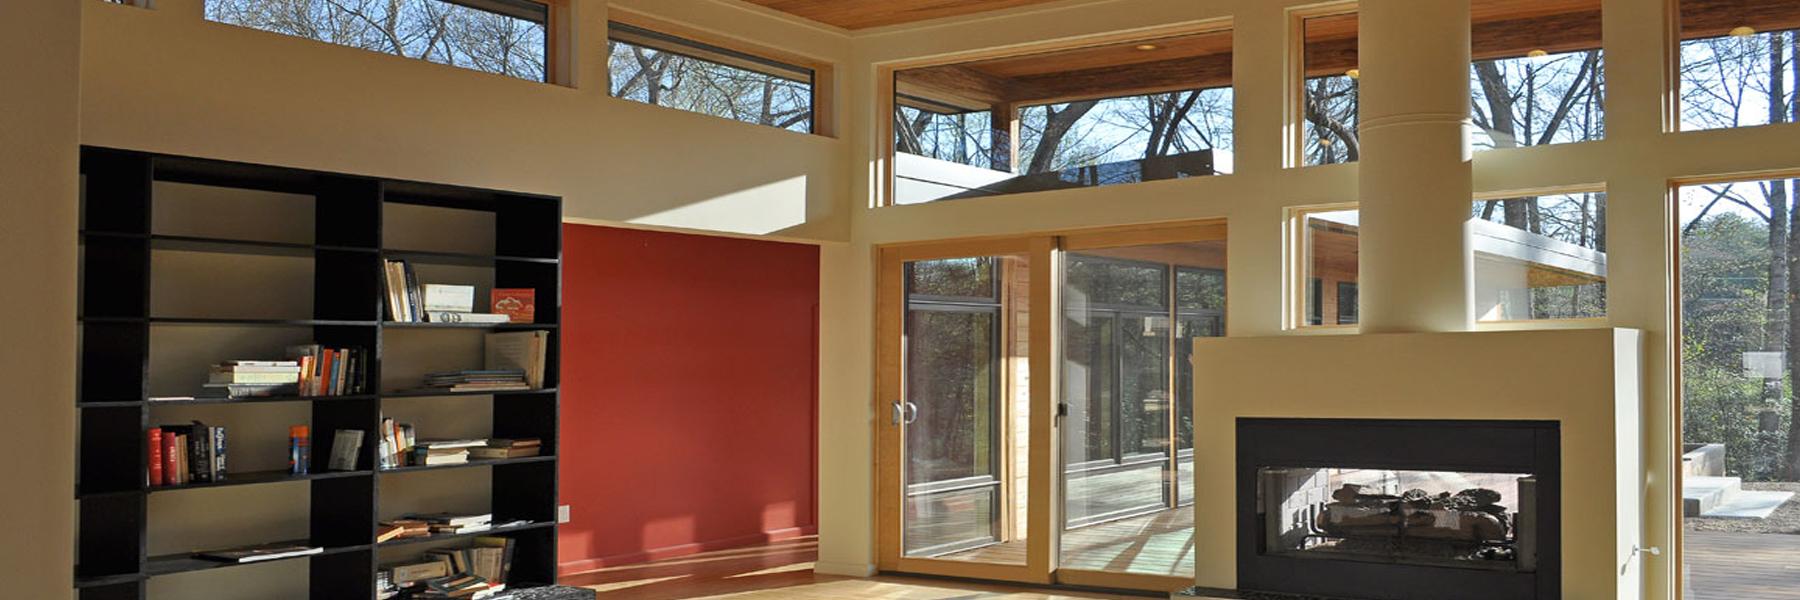 Doors & Windows in Richmond and Lexington KY | Hager ...